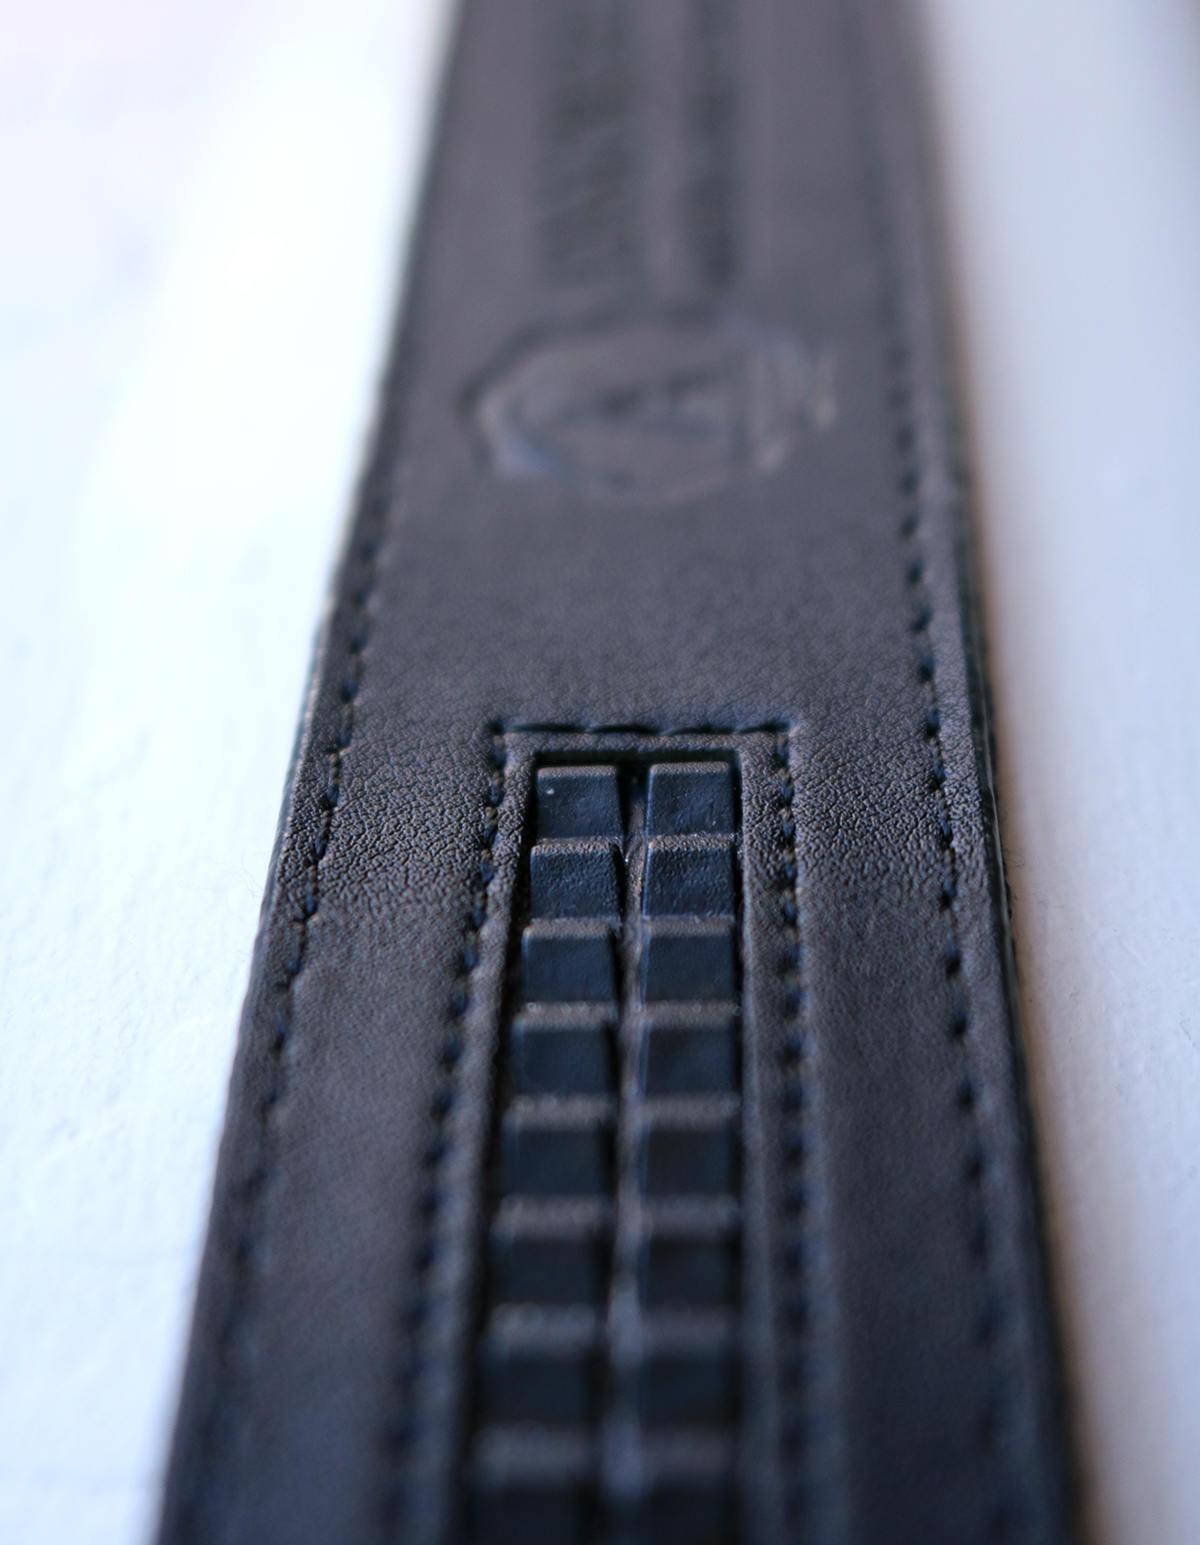 Slide belt track grooves